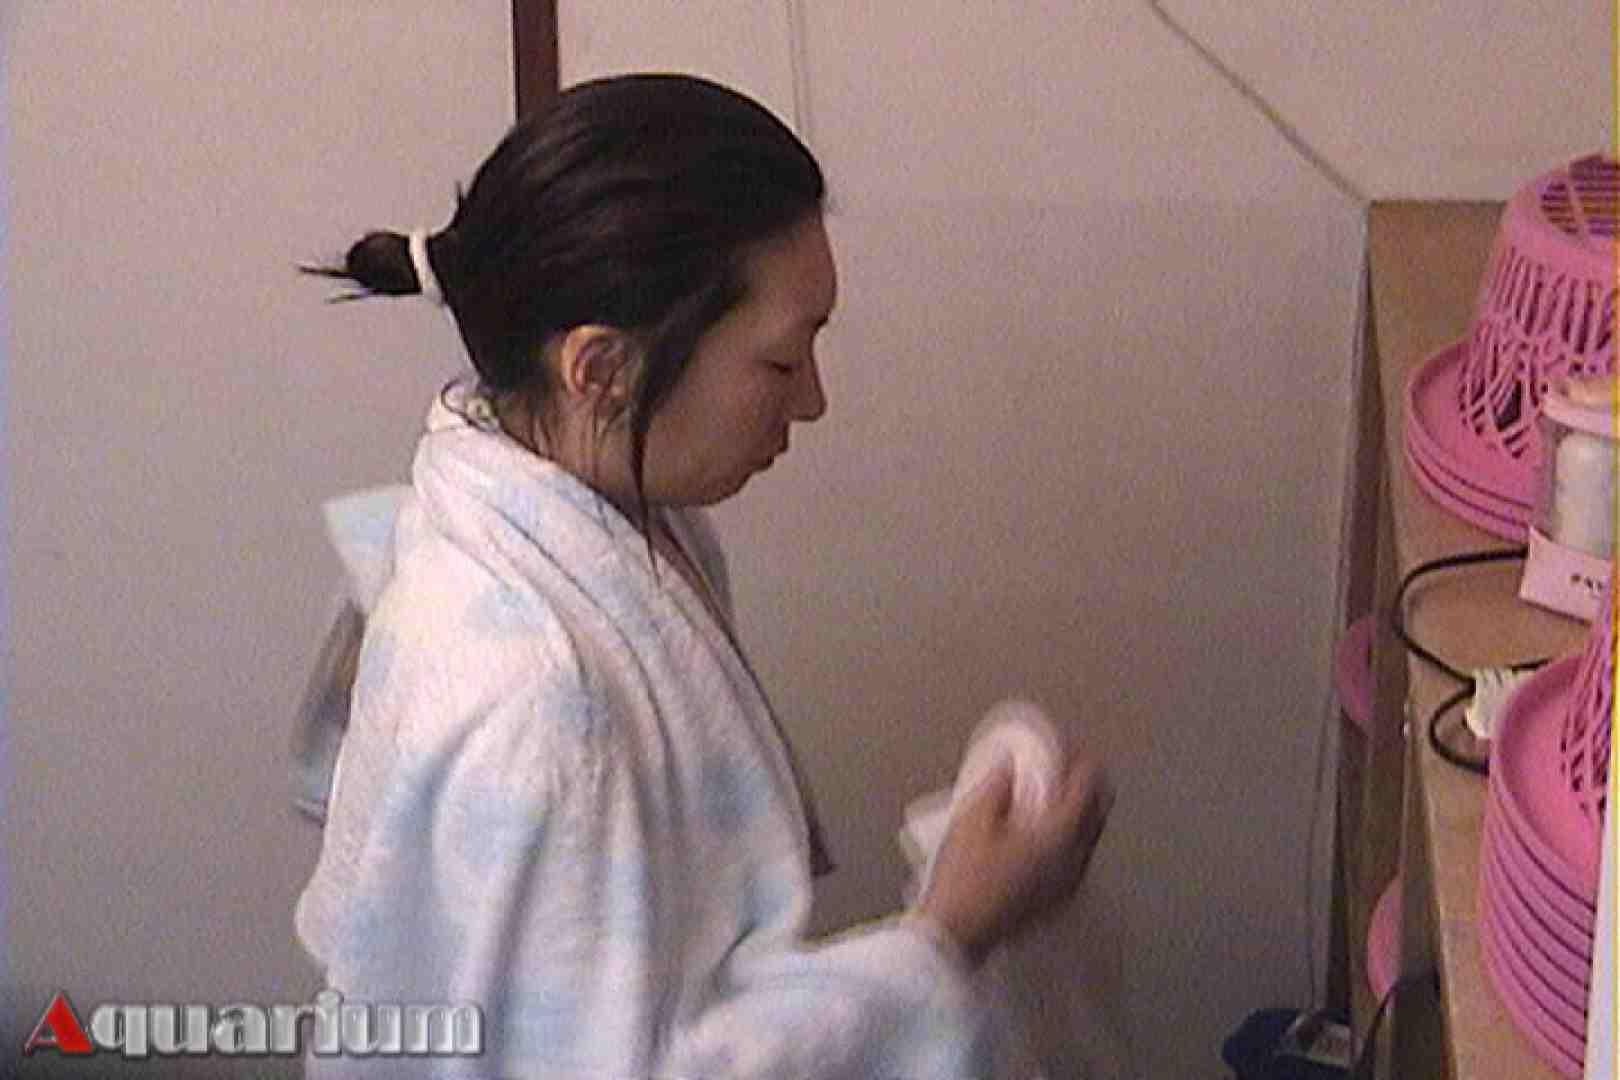 旅館脱衣所お着替え盗撮 Vol.03 脱衣所  97連発 72